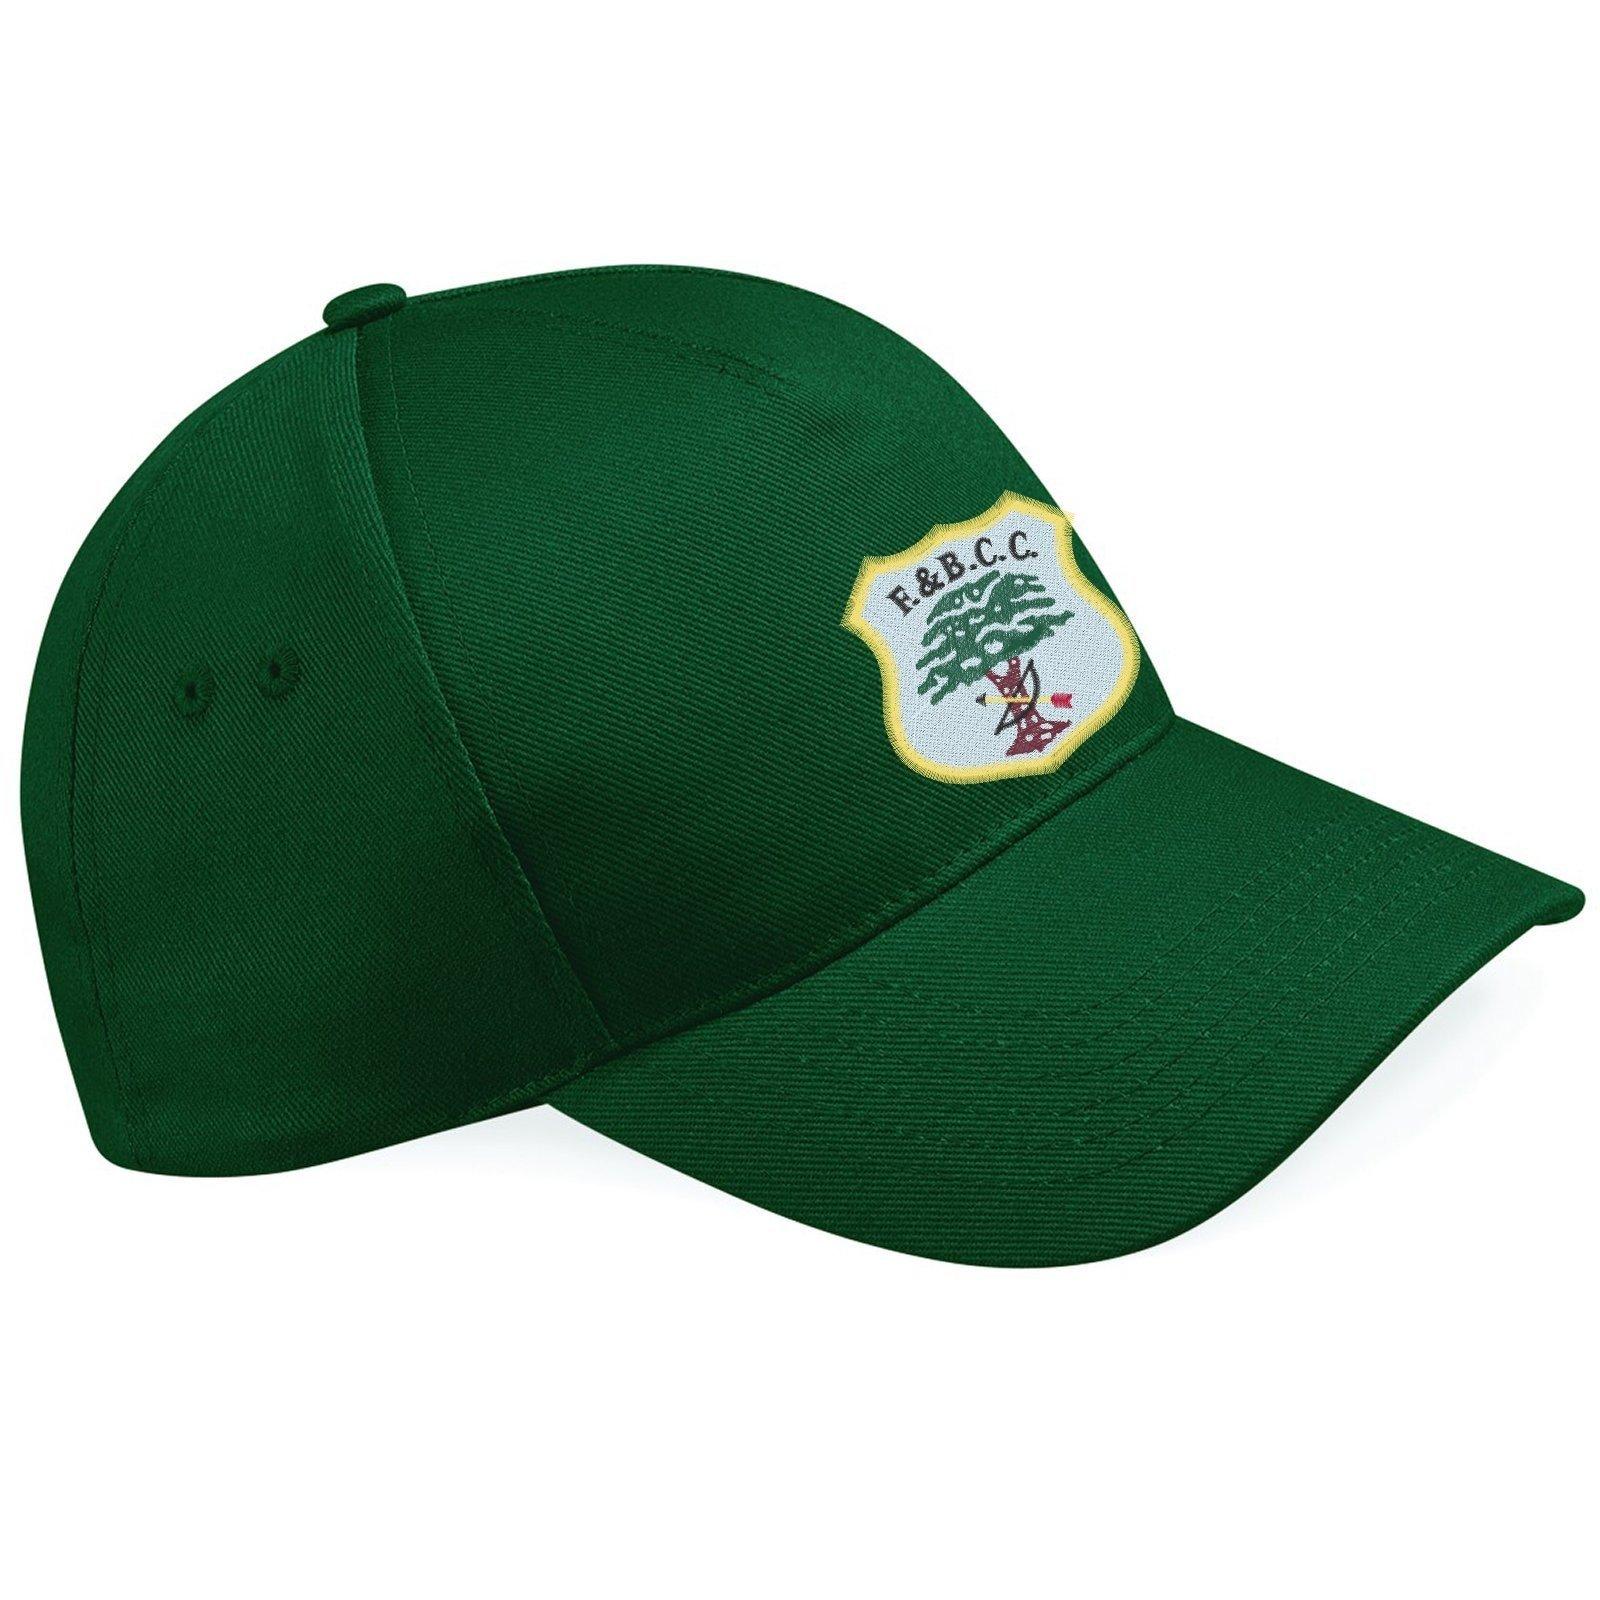 Fulwood & Broughton CC Green Baseball Cap